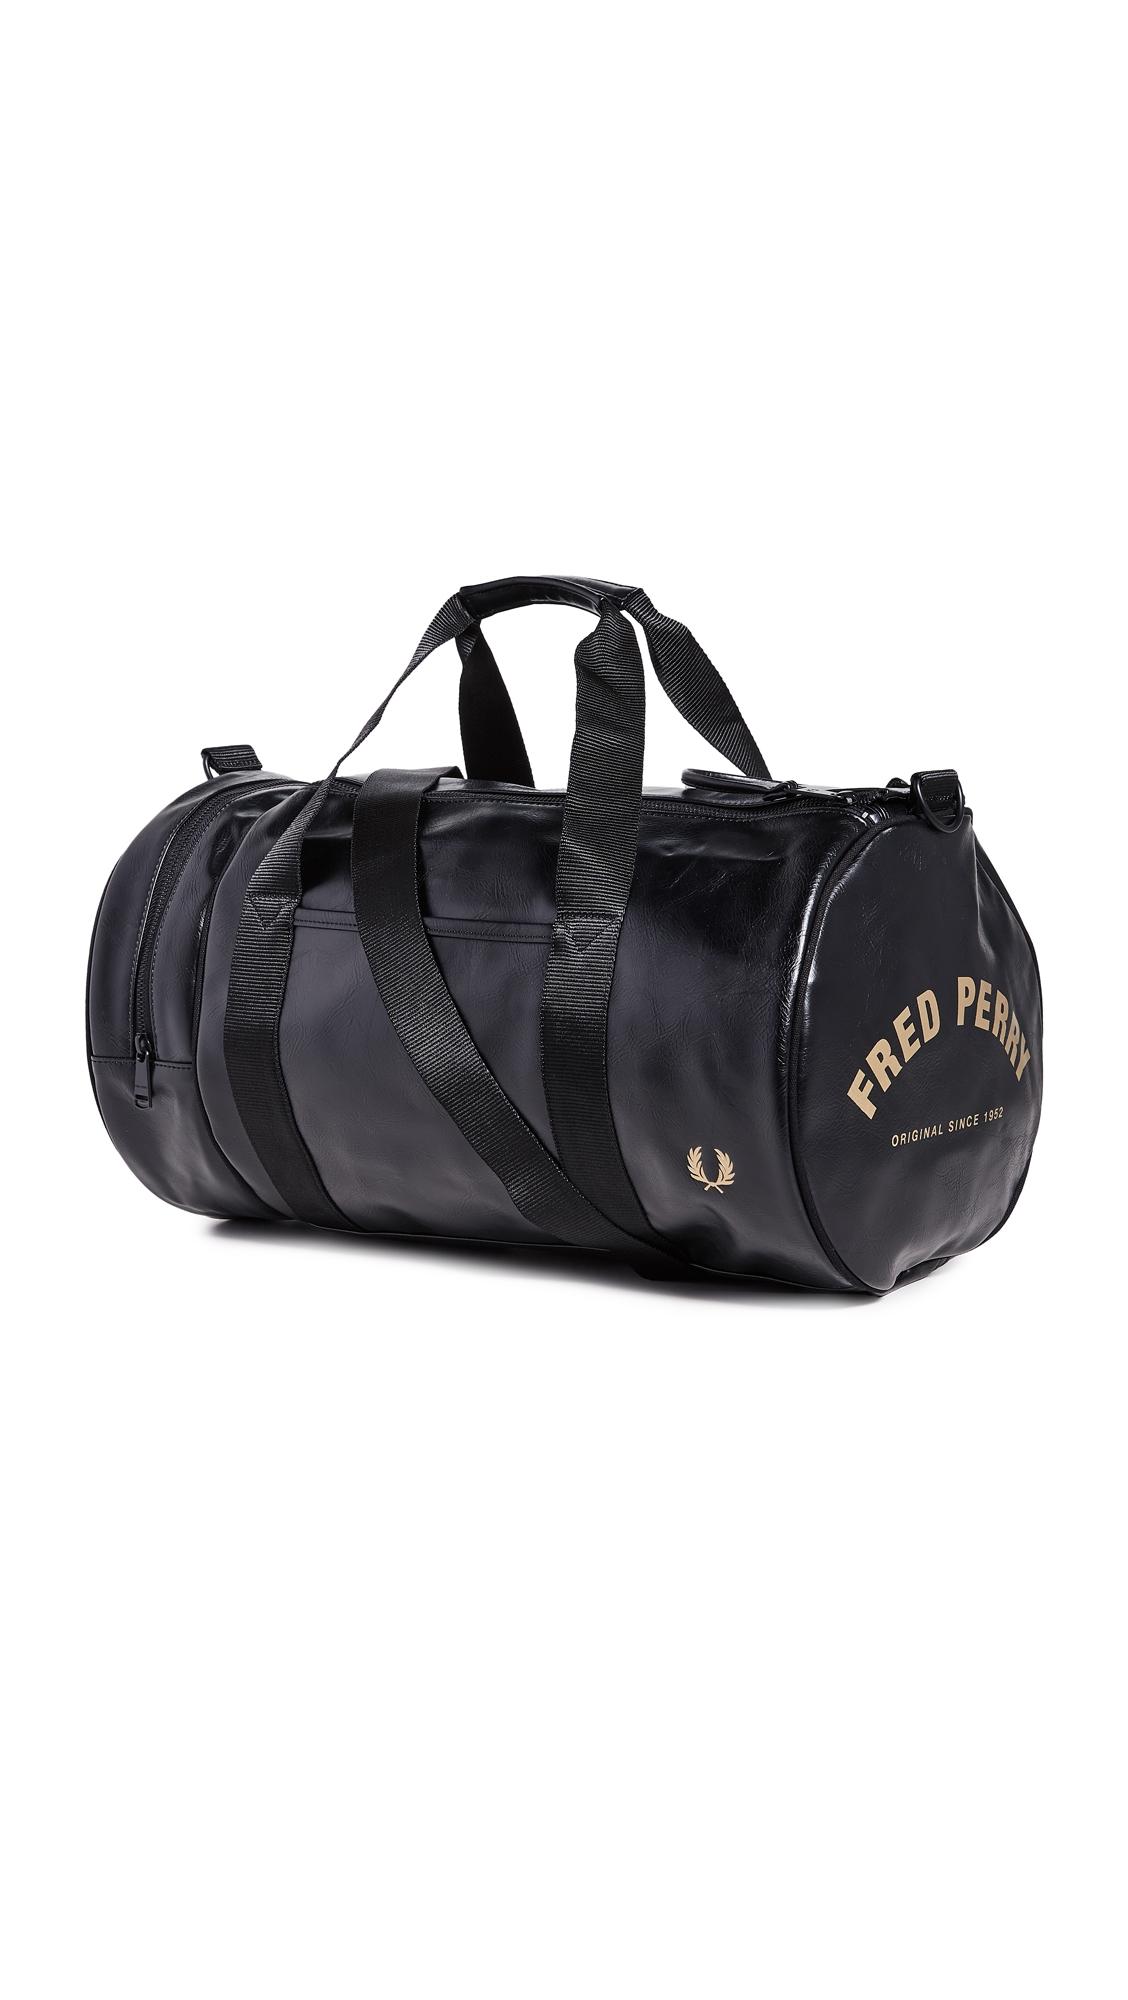 Fred Perry Bags TONAL PU BARREL BAG